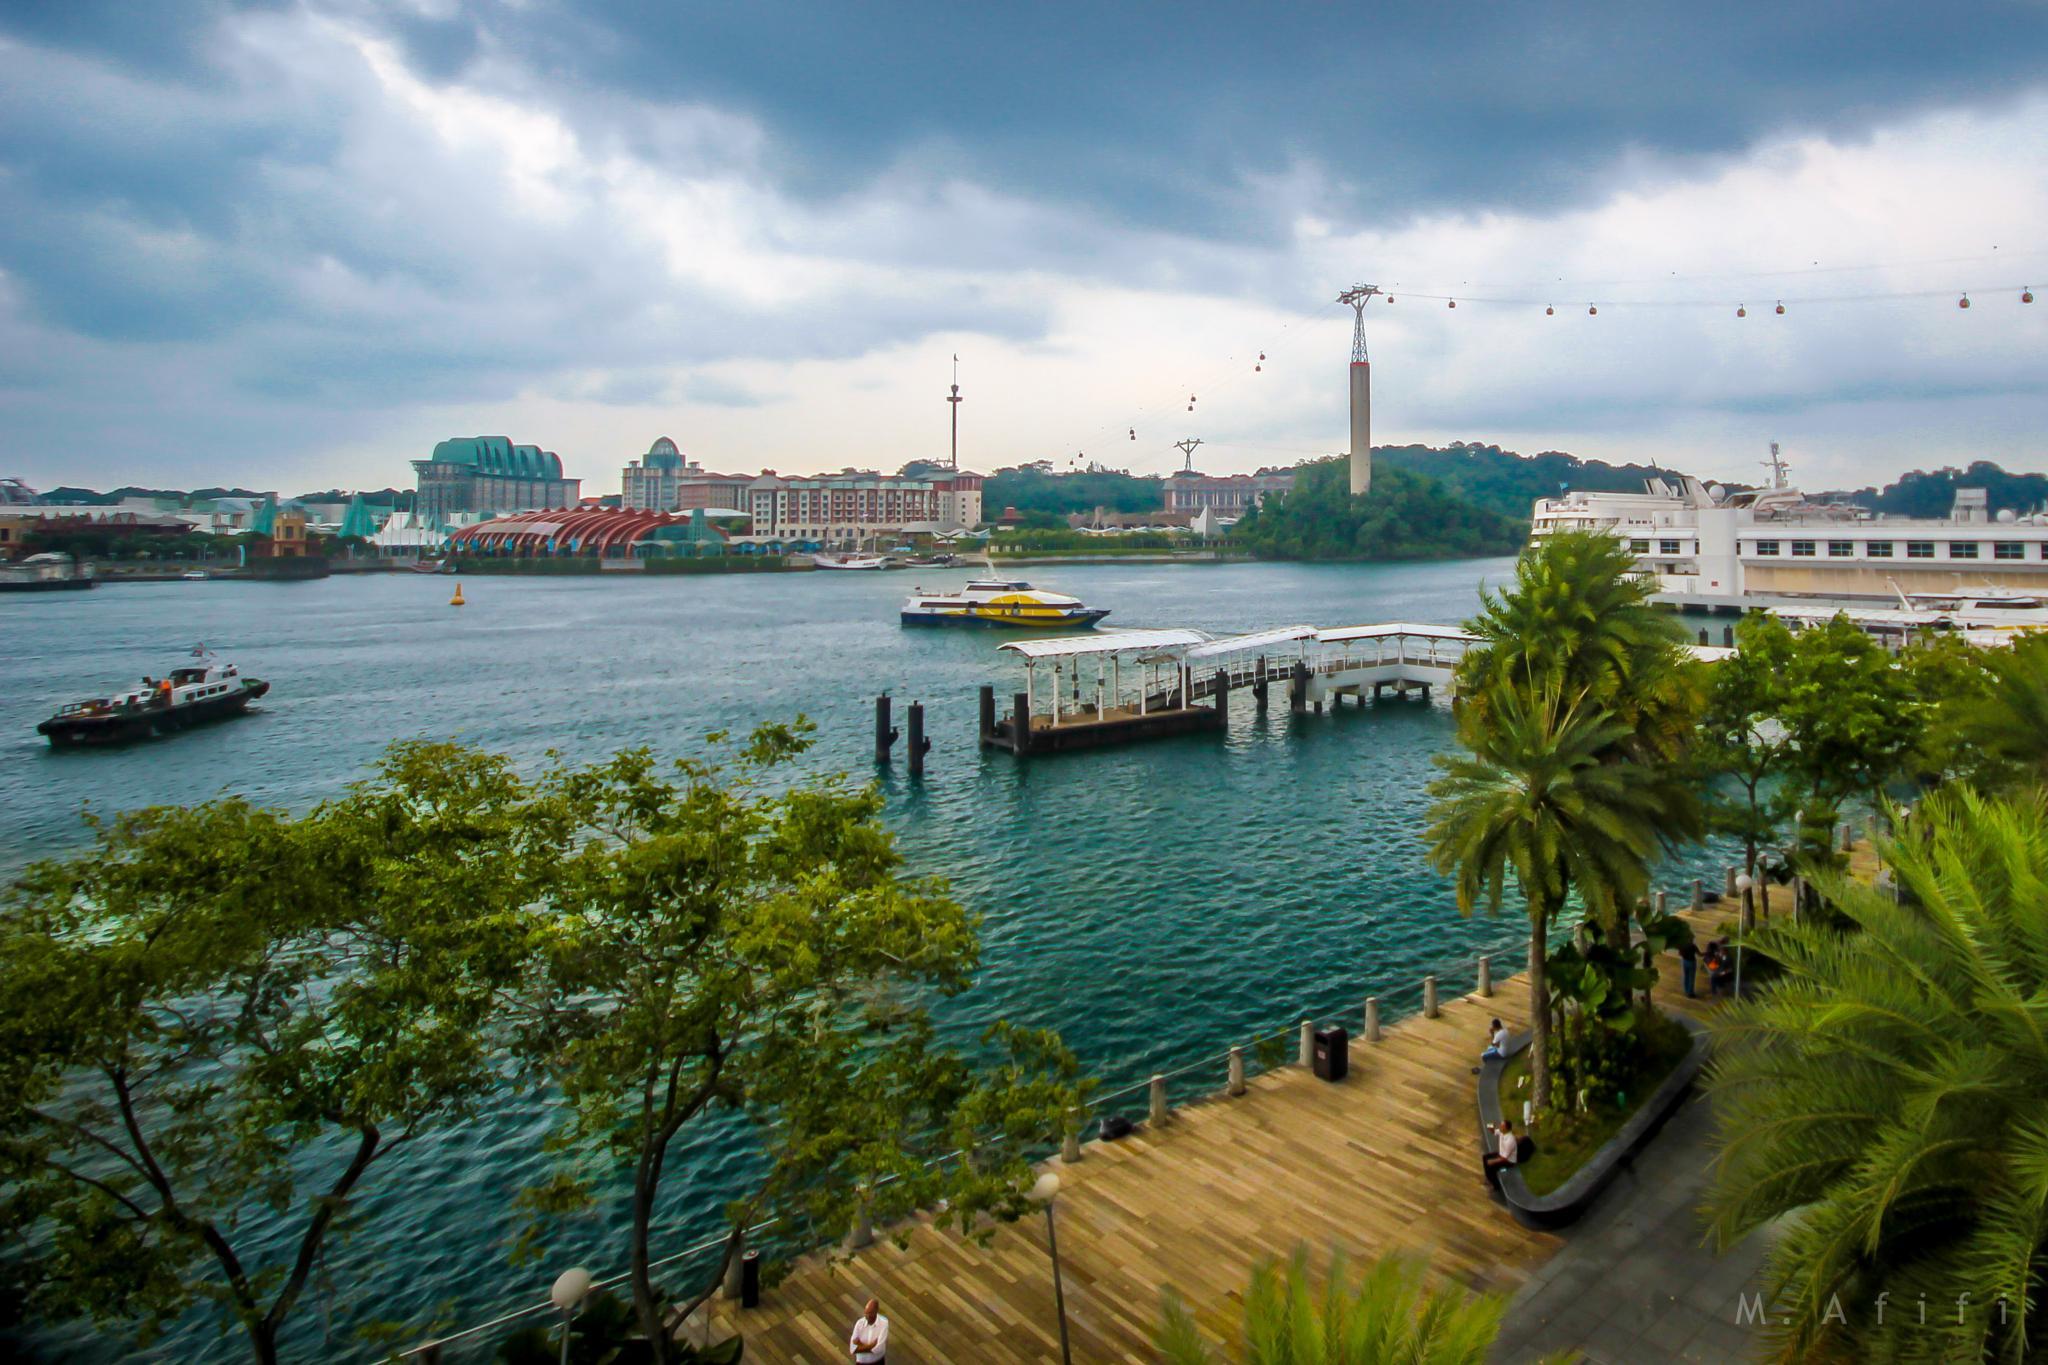 Singapore 1 by M. Afifi